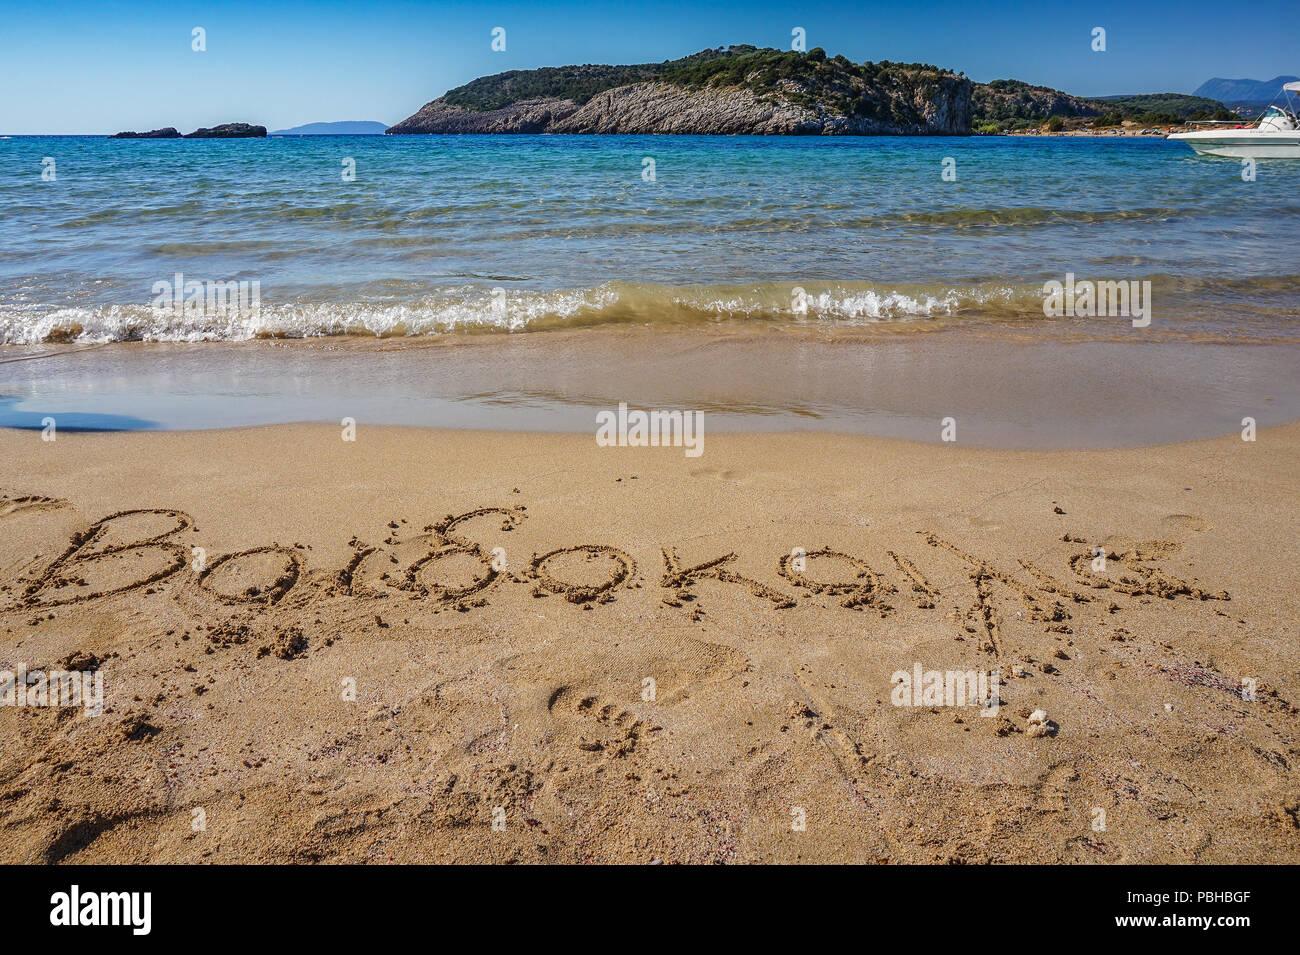 The amazing sandy beach of Voidokilia in Messenia, Peloponnese, Greece - Stock Image